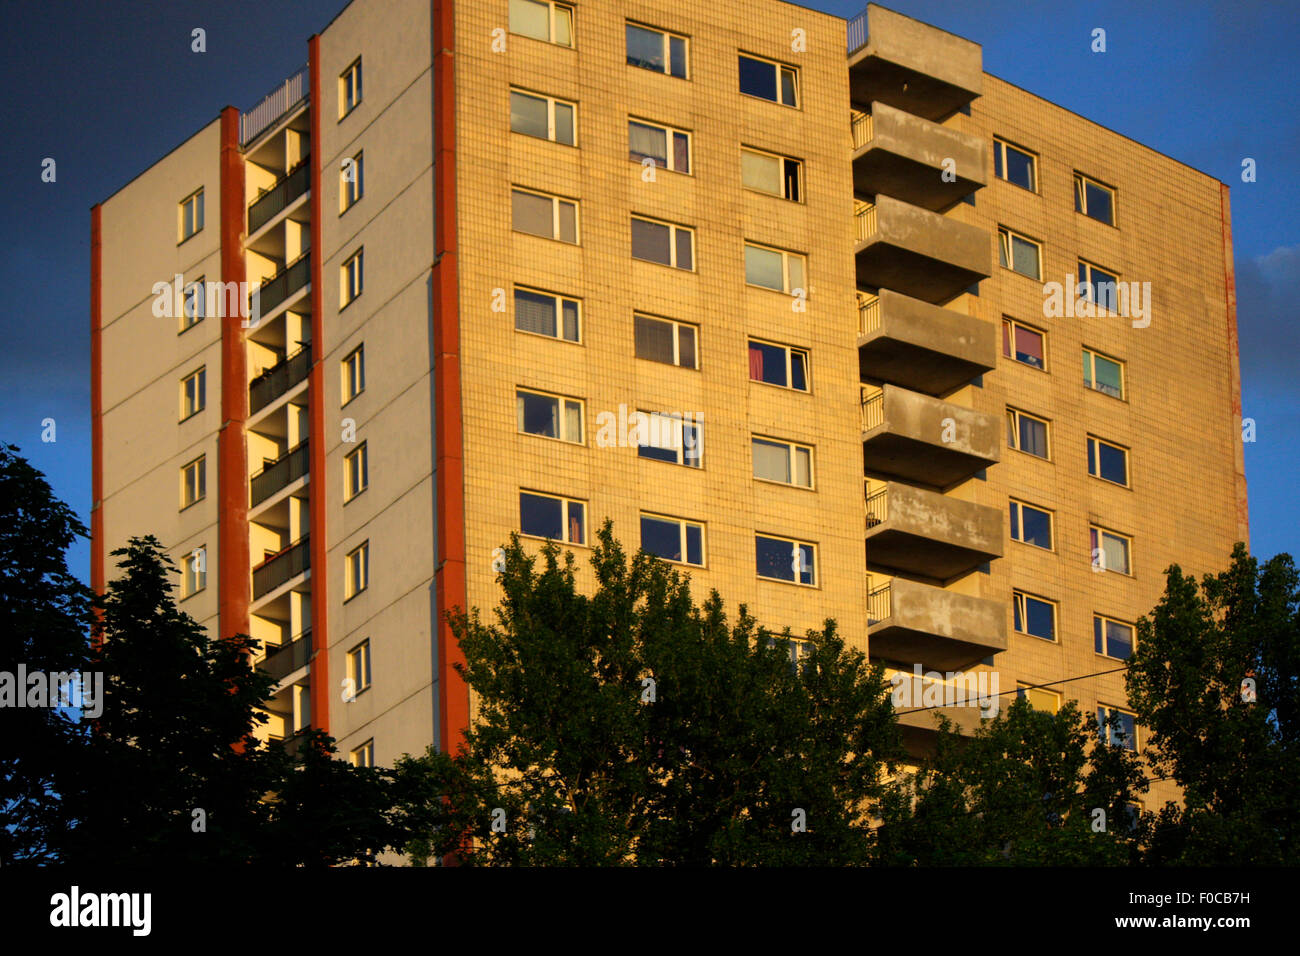 Hochhaus, hansaviertel, Berlin -Tiergarten. - Stock Image